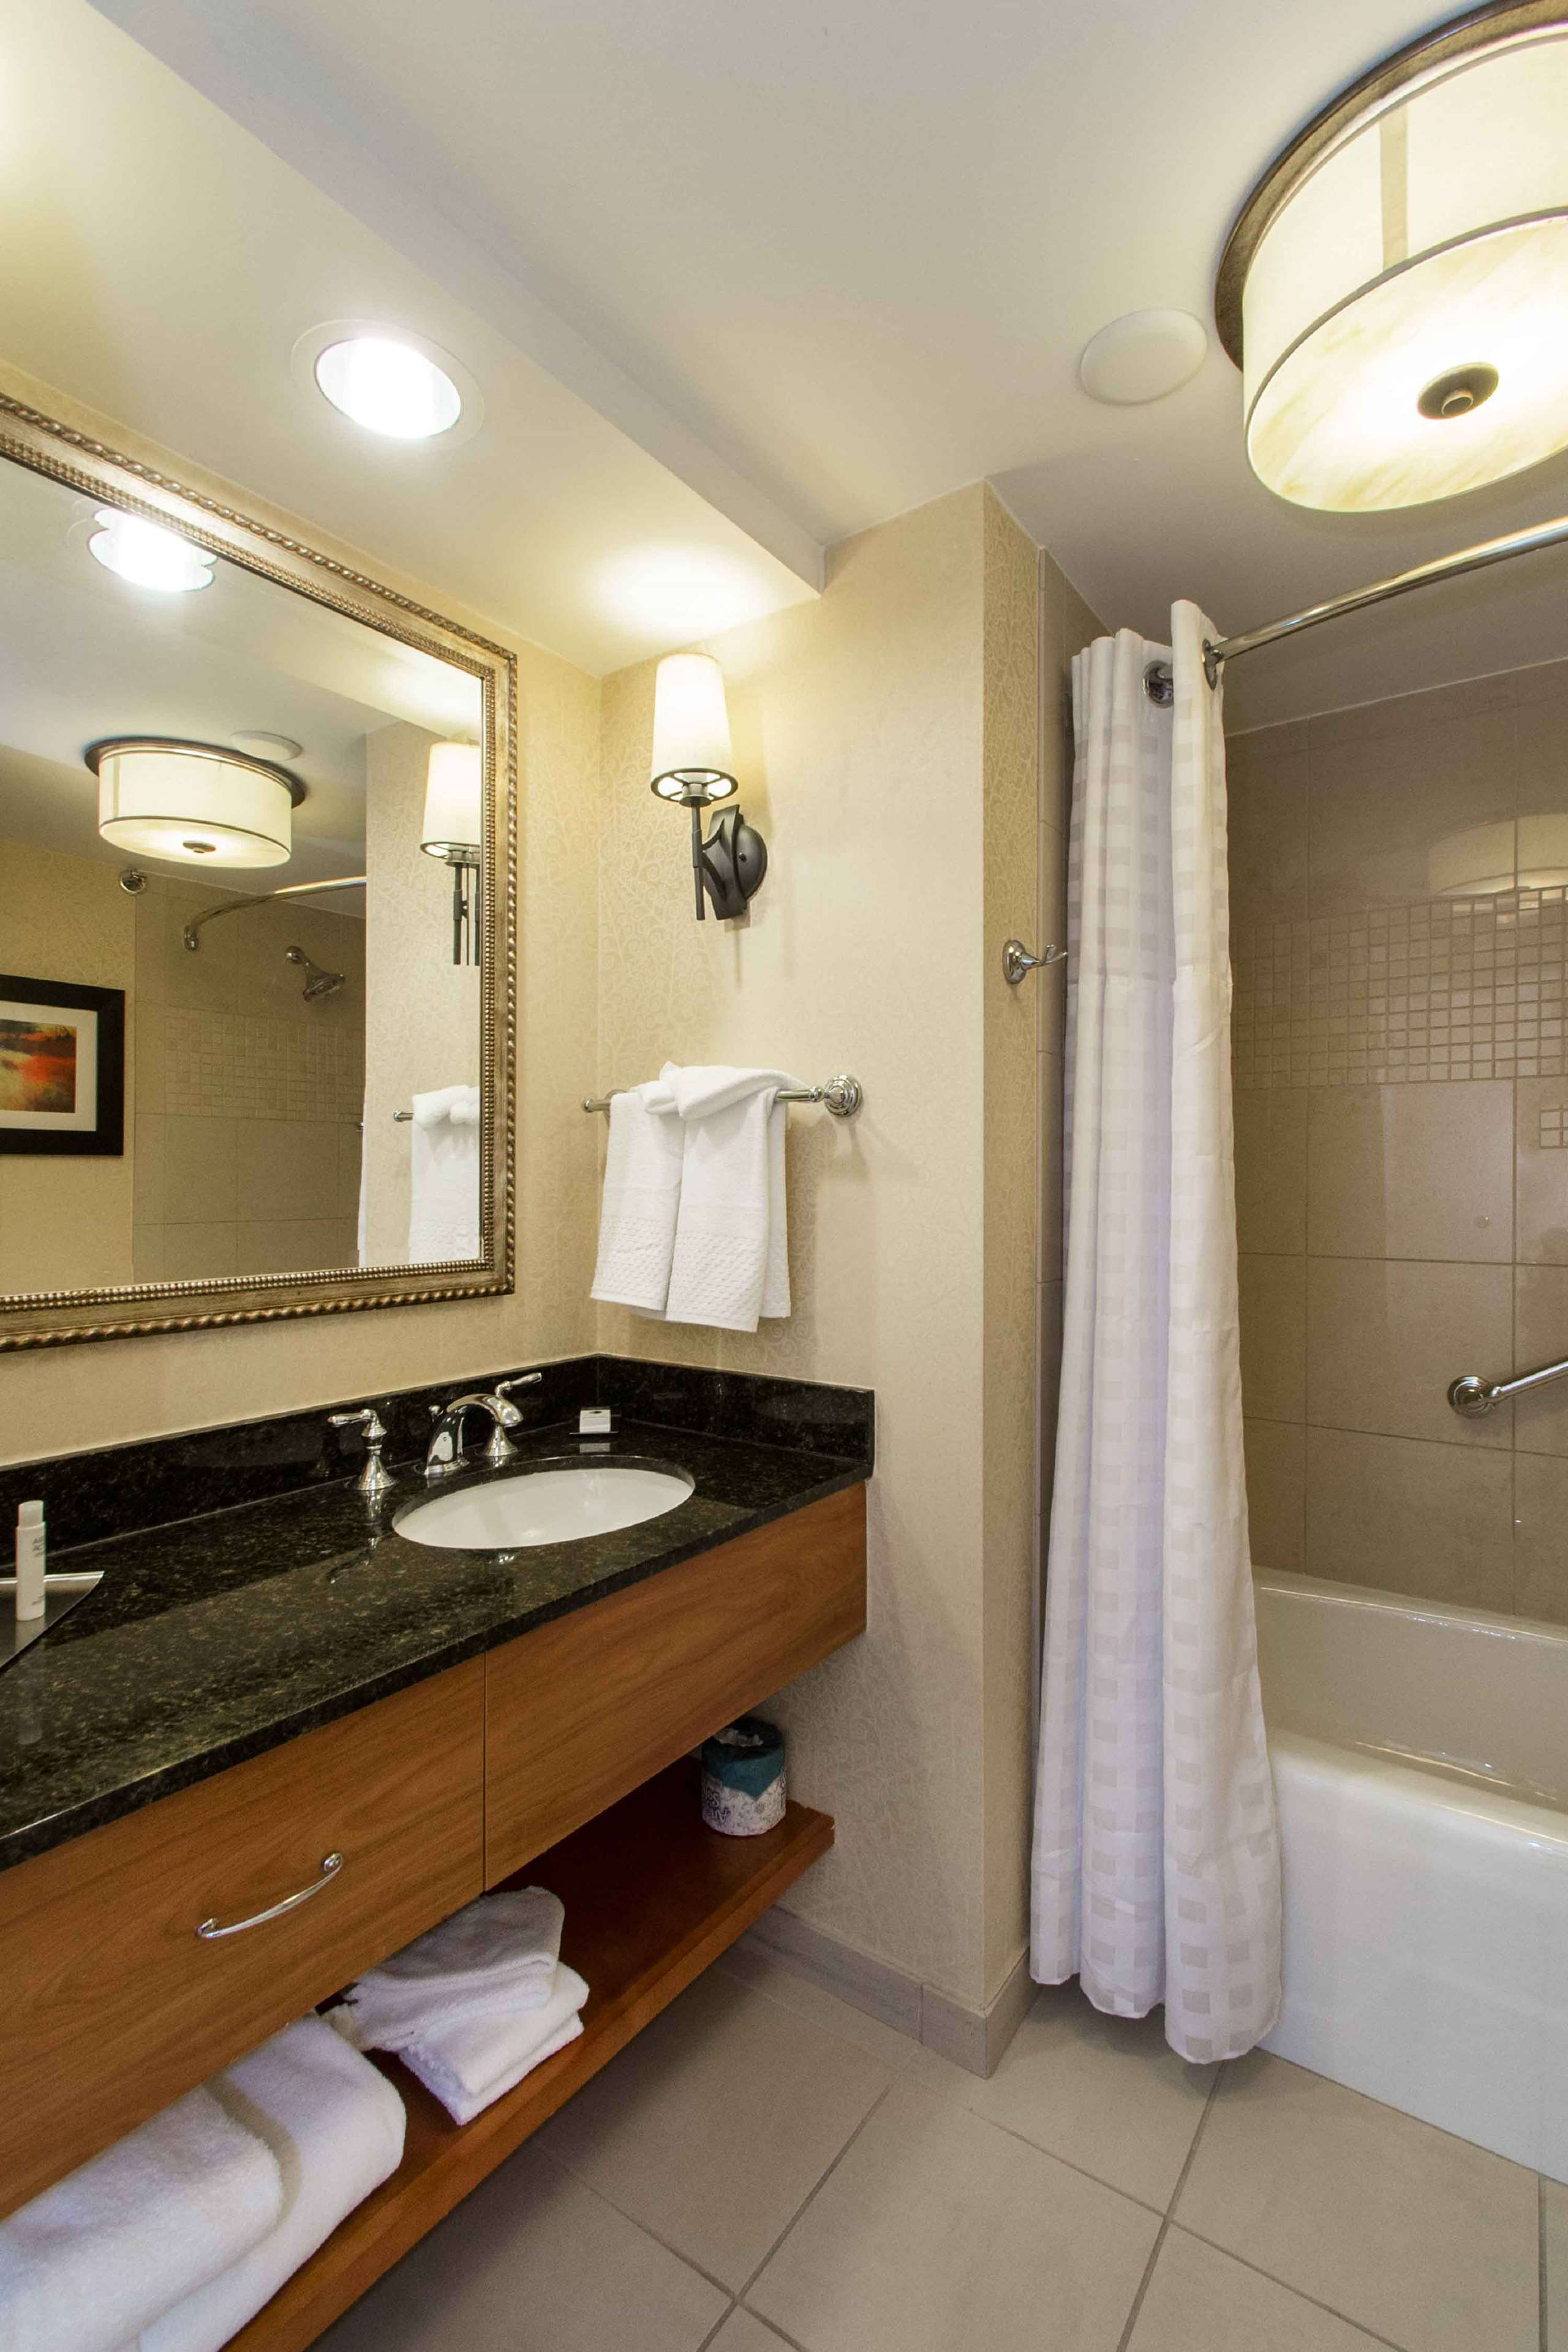 DoubleTree by Hilton Hotel Cleveland East Beachwood image 31